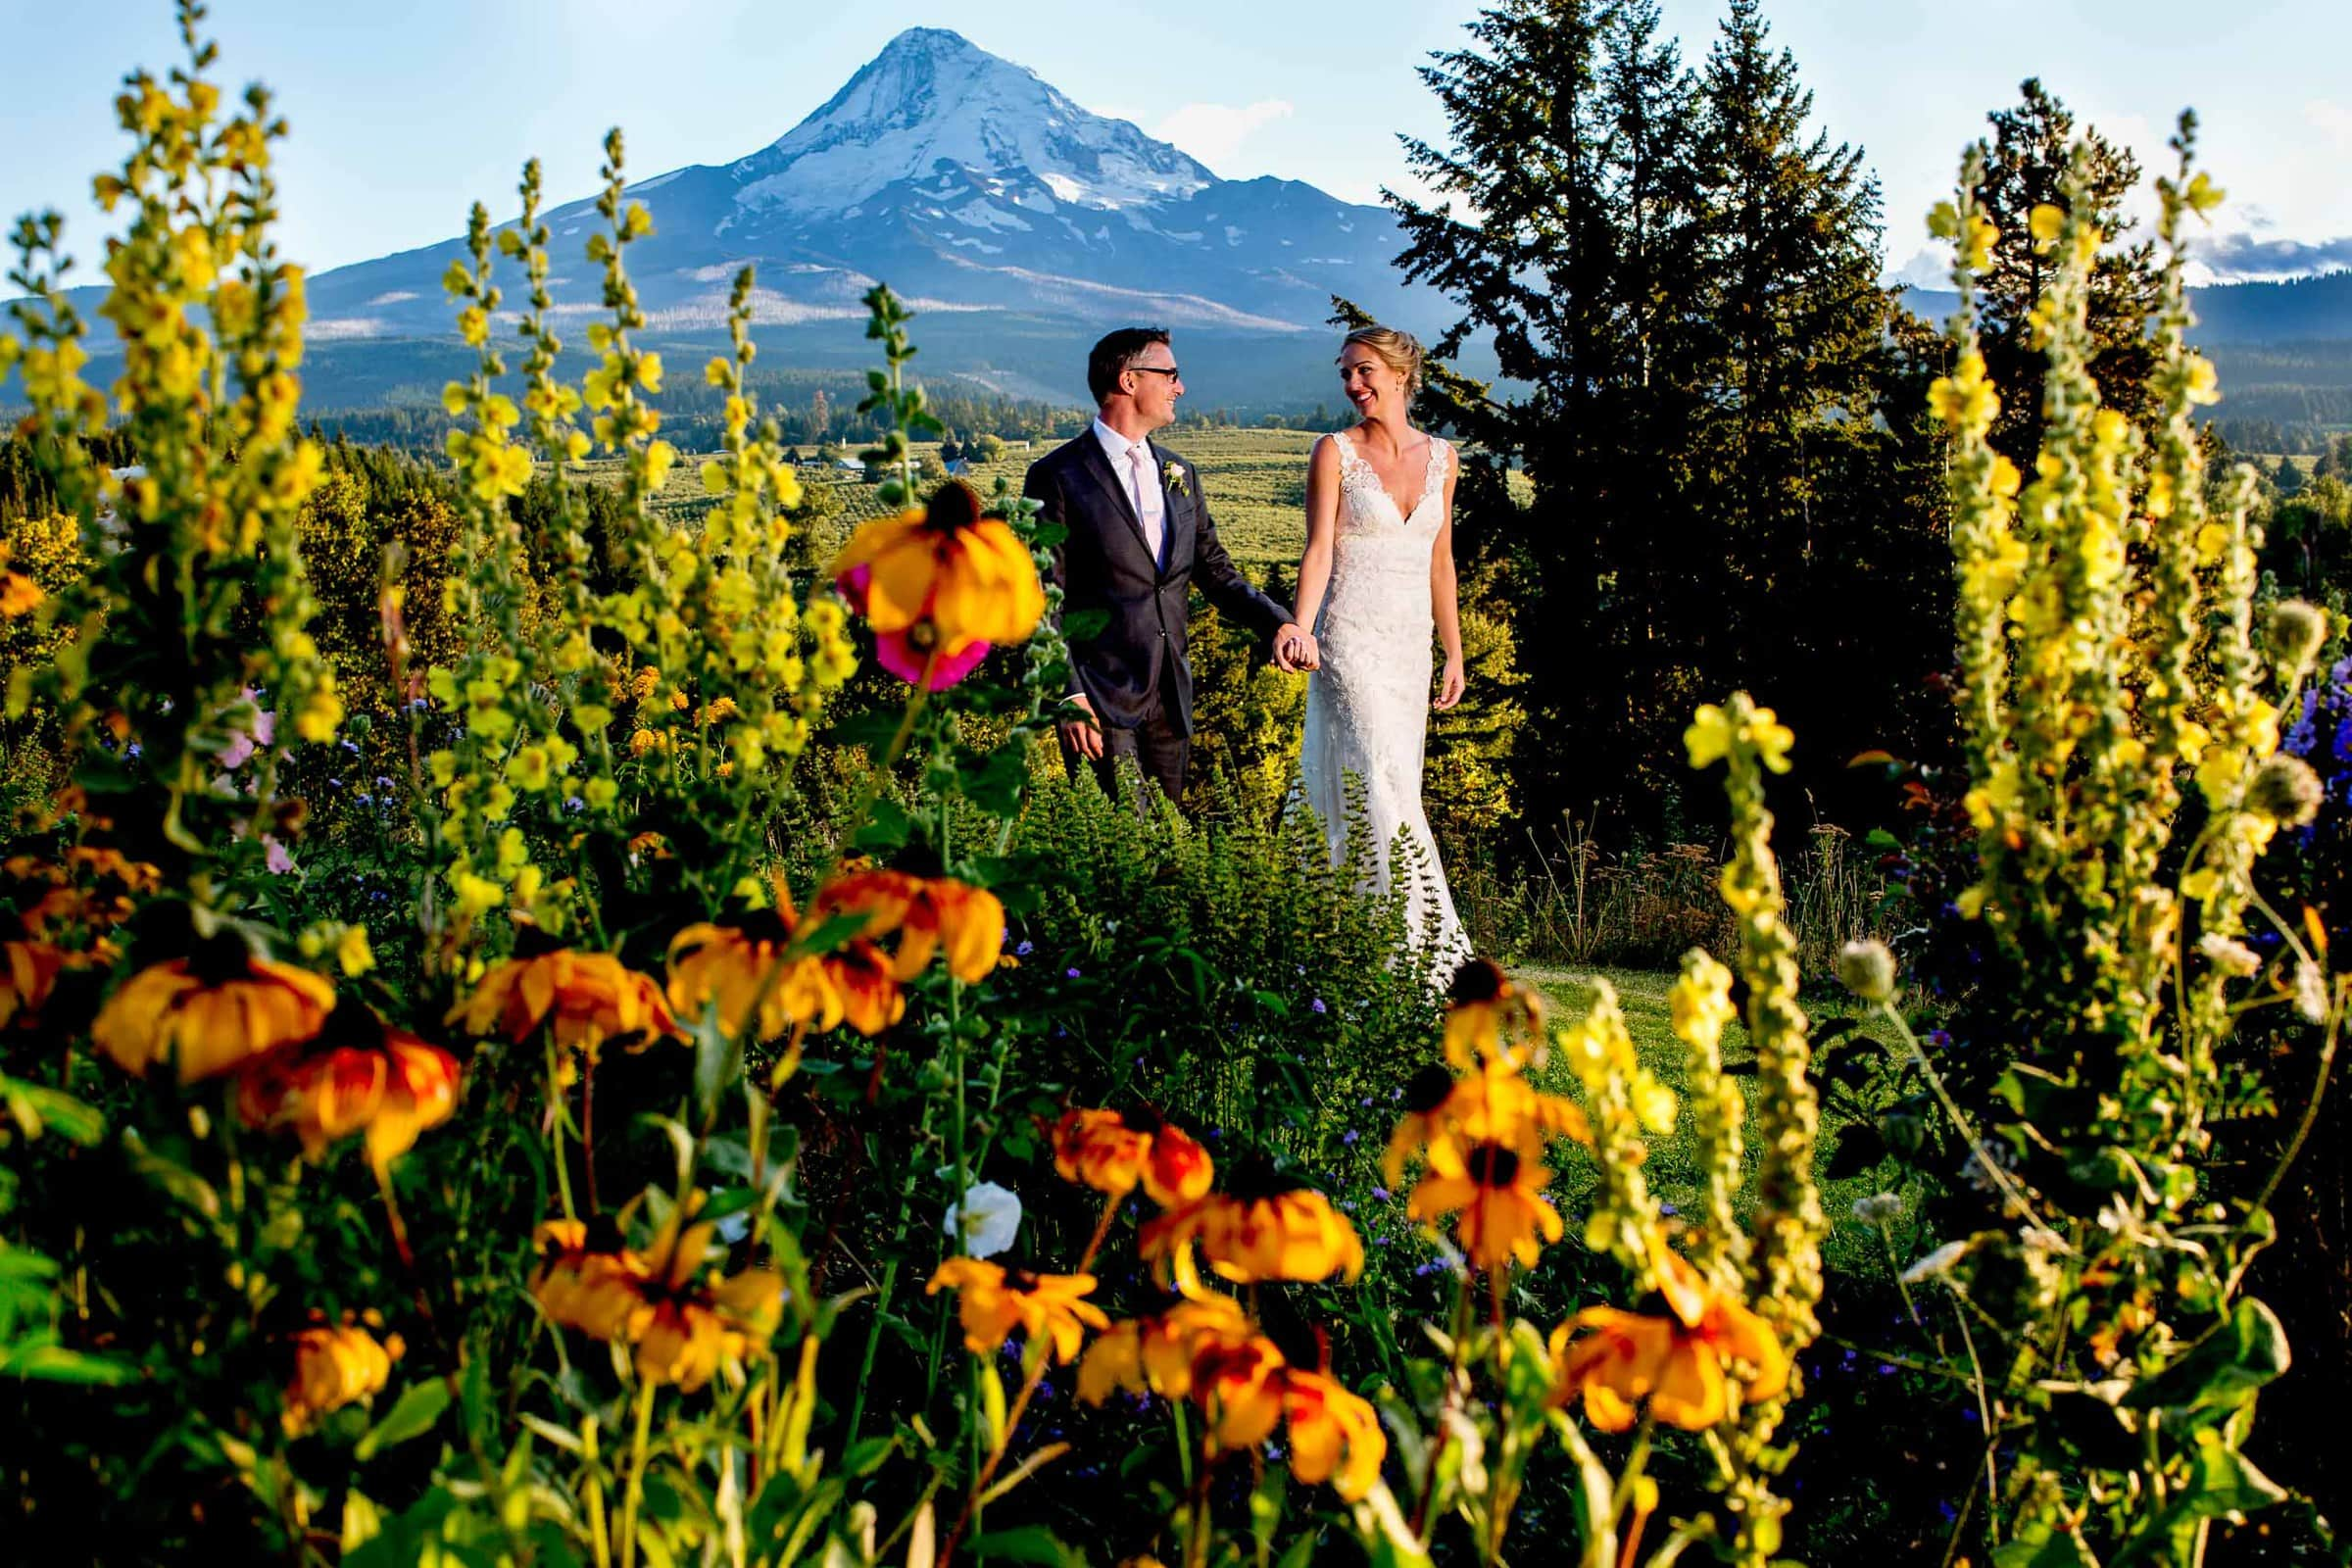 Bride and groom walking through flowers at sunset during their Mt Hood Organic Farms wedding near Hood River Oregon